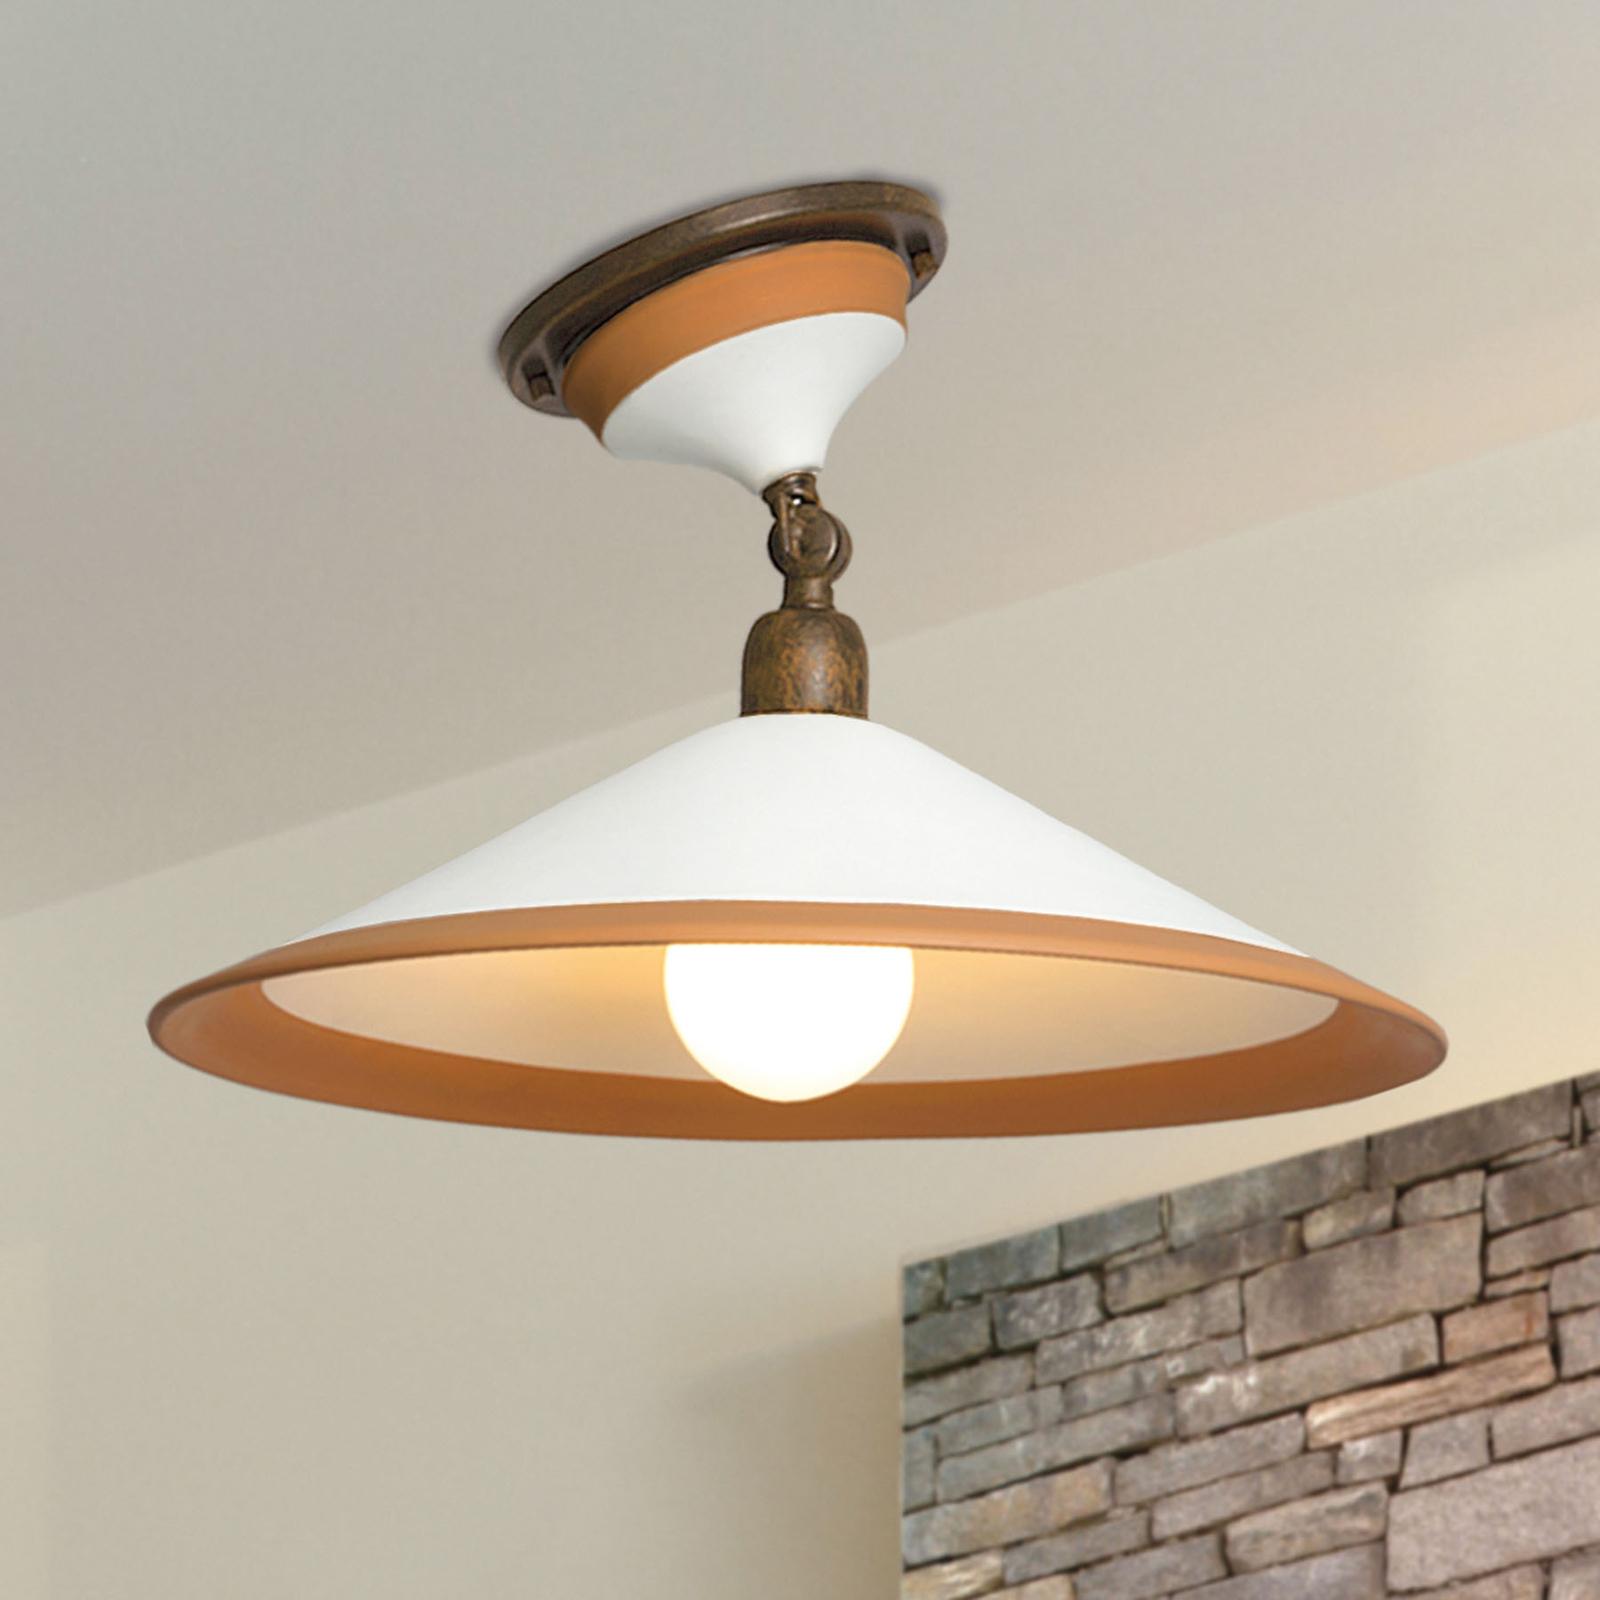 Plafondlamp 4560/PL41, bruin, wit, oker